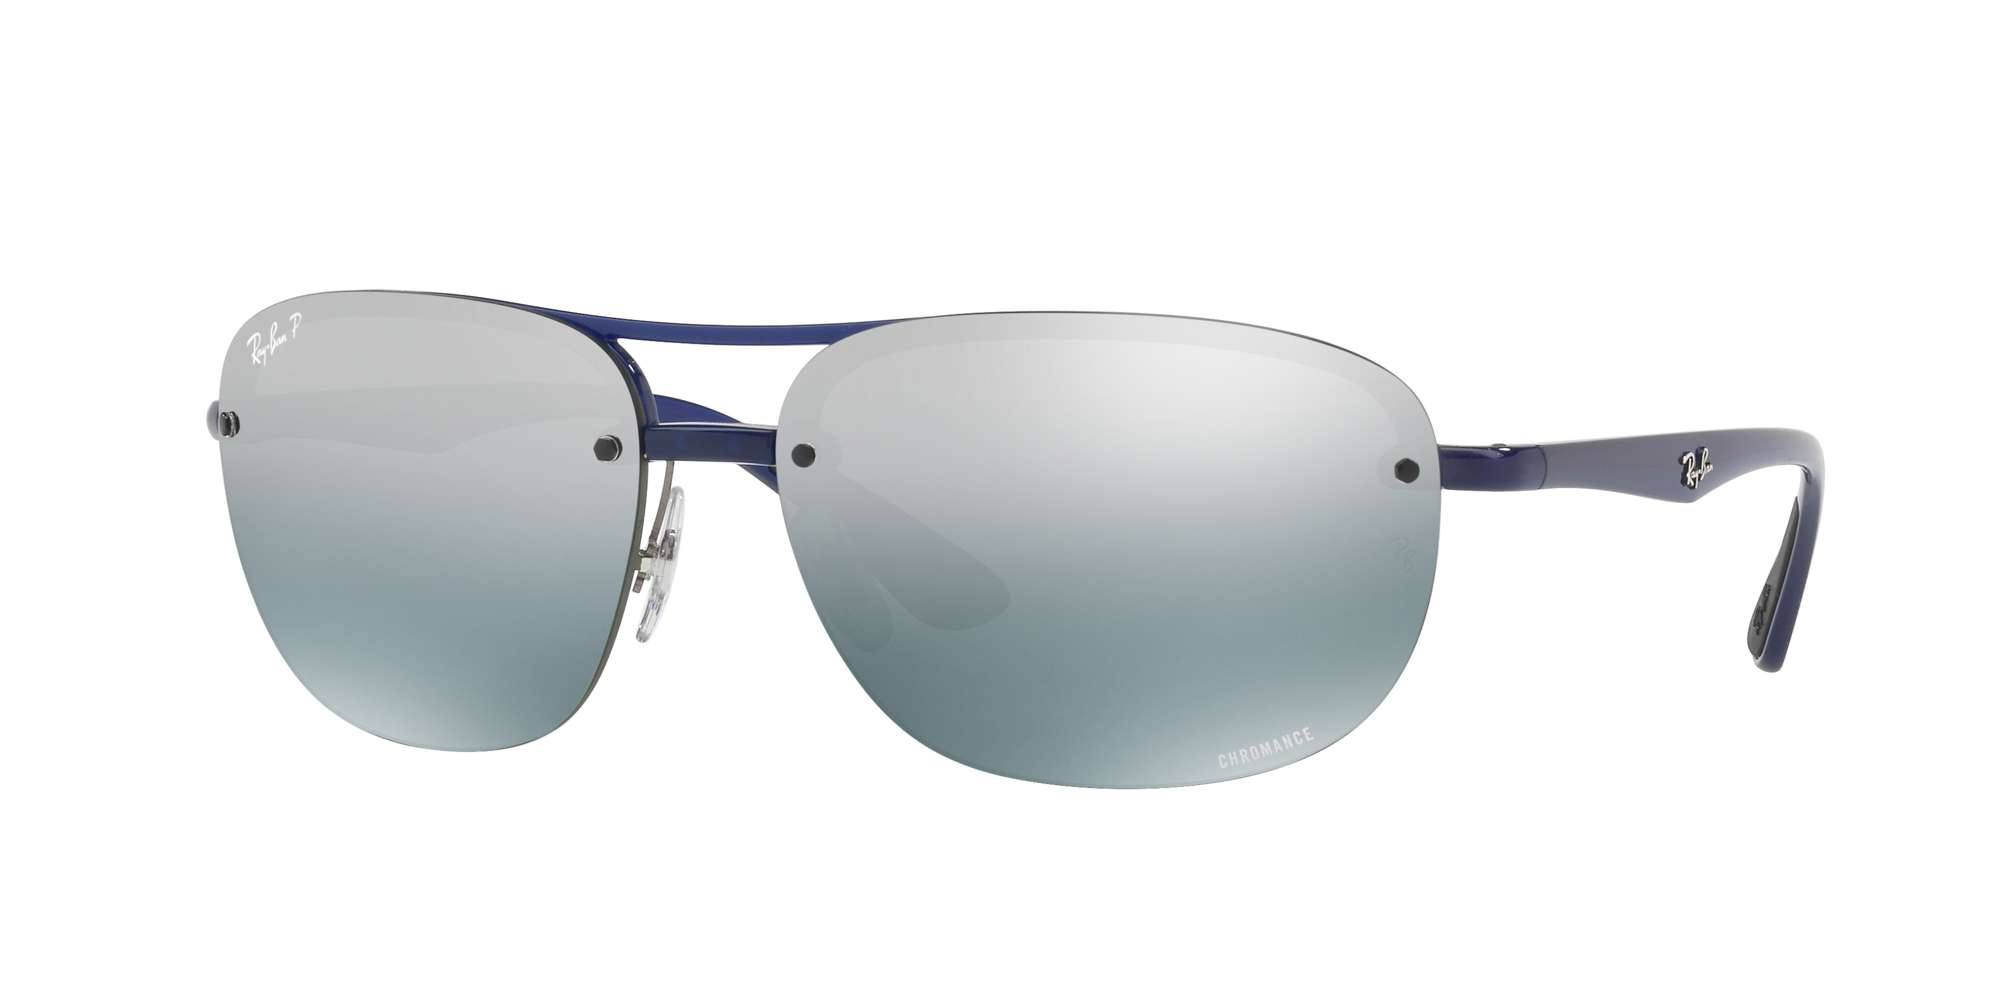 BLUE / BLUE MIR GREY GRADIENT POLAR lenses